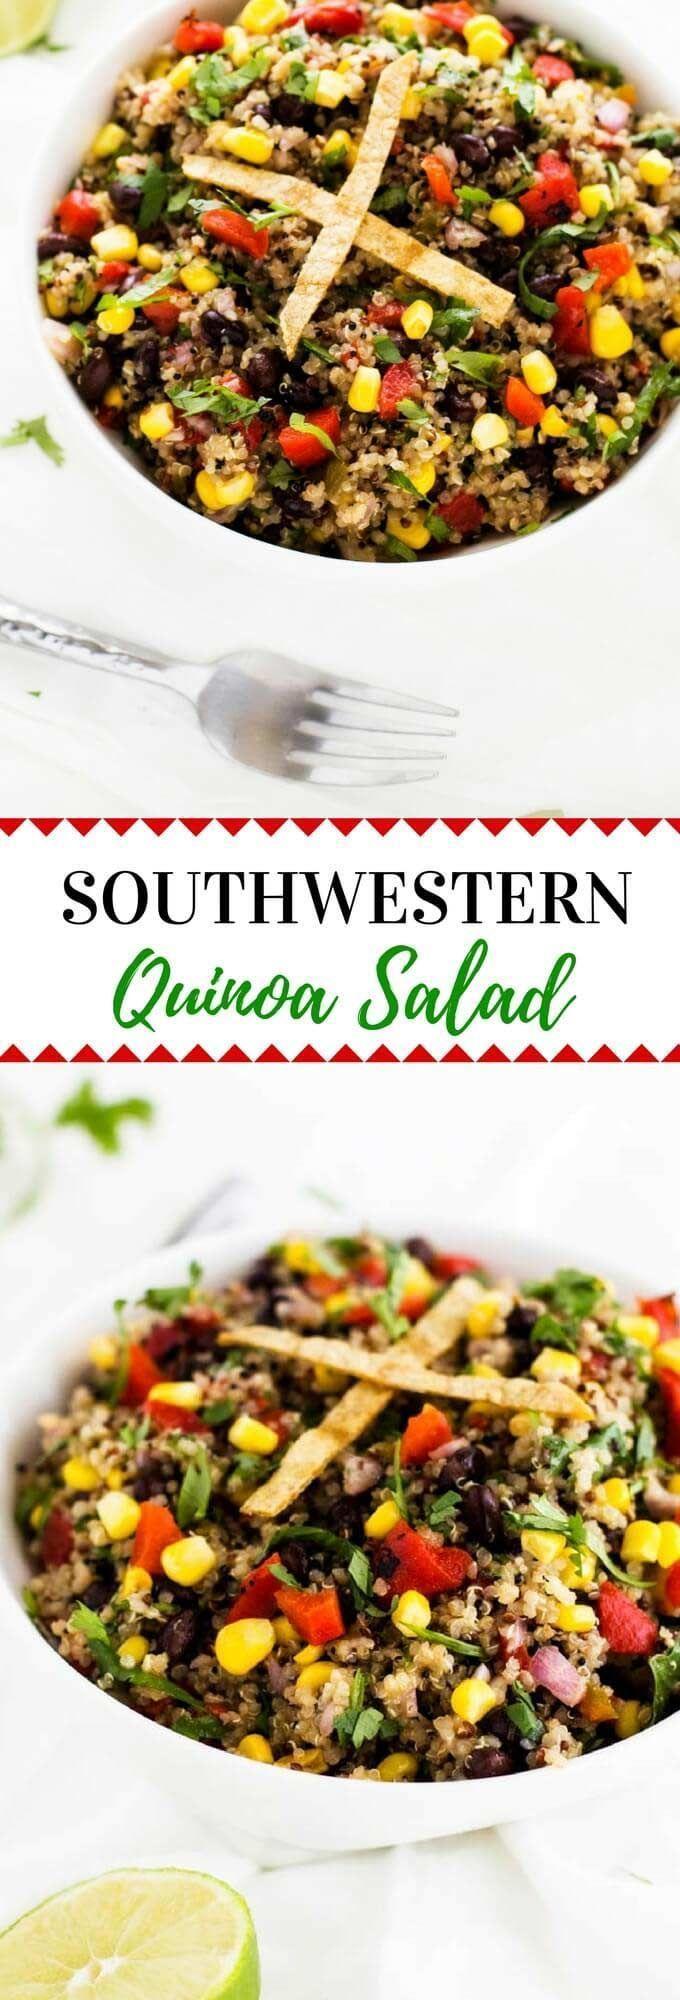 Southwestern Quinoa Salad - This Southwestern Quinoa... - Adella Lurie -